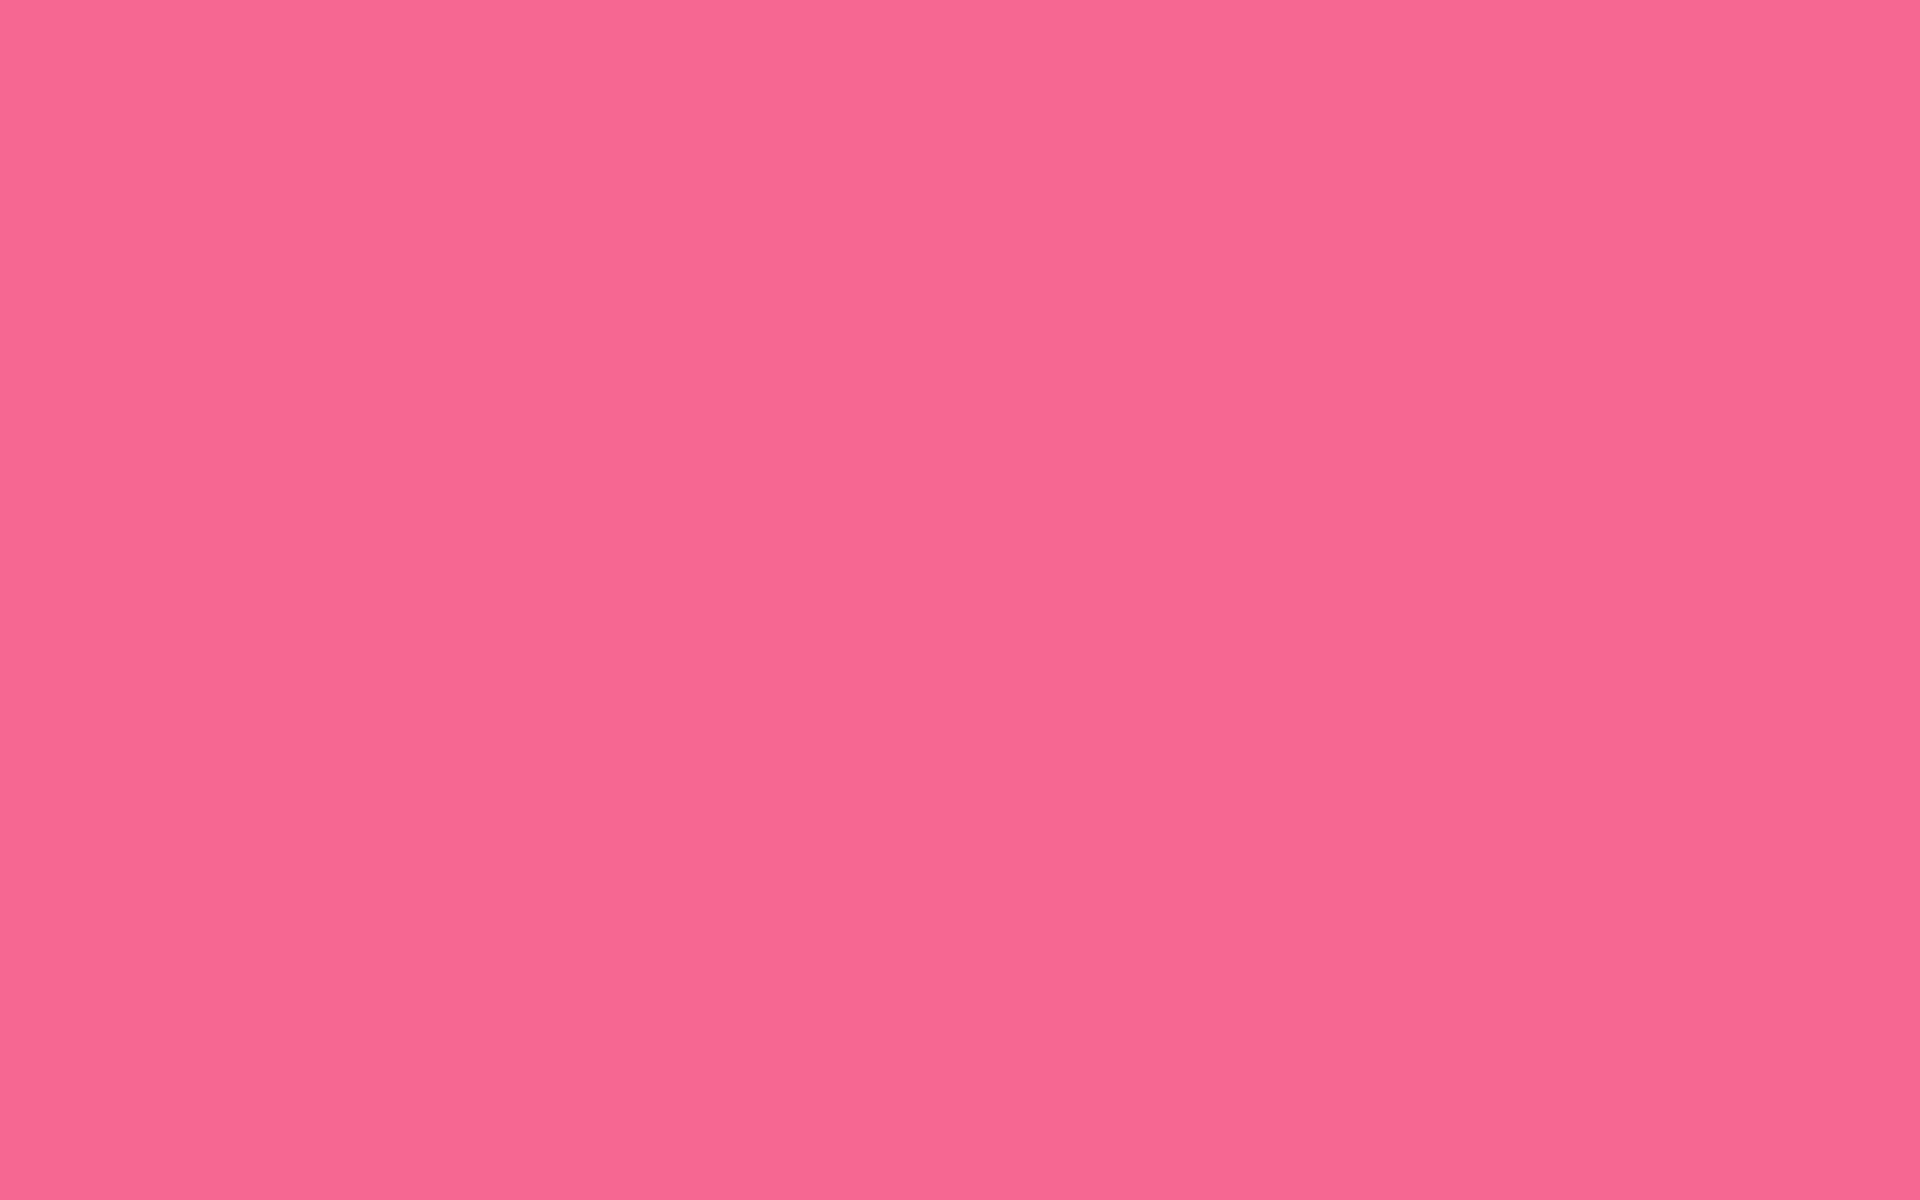 1920x1200 Light Crimson Solid Color Background